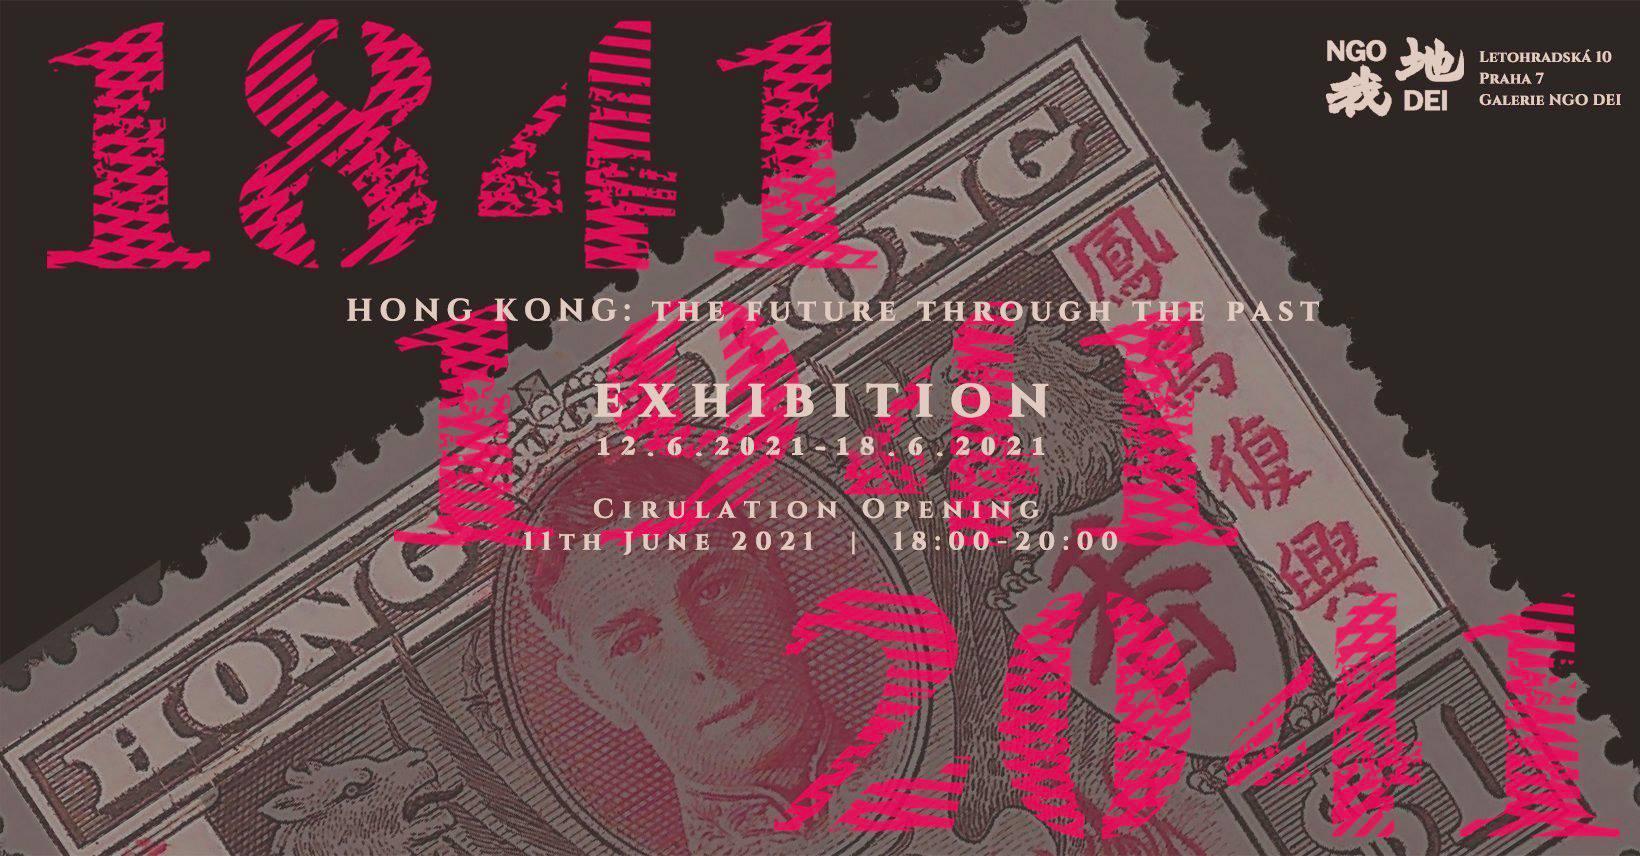 VERNISÁŽ | PÁTEK 11.6.od 18:30 | 184119412041 – Hong Kong the future through the past | NGO DEI / Letohradská 10, Praha 7